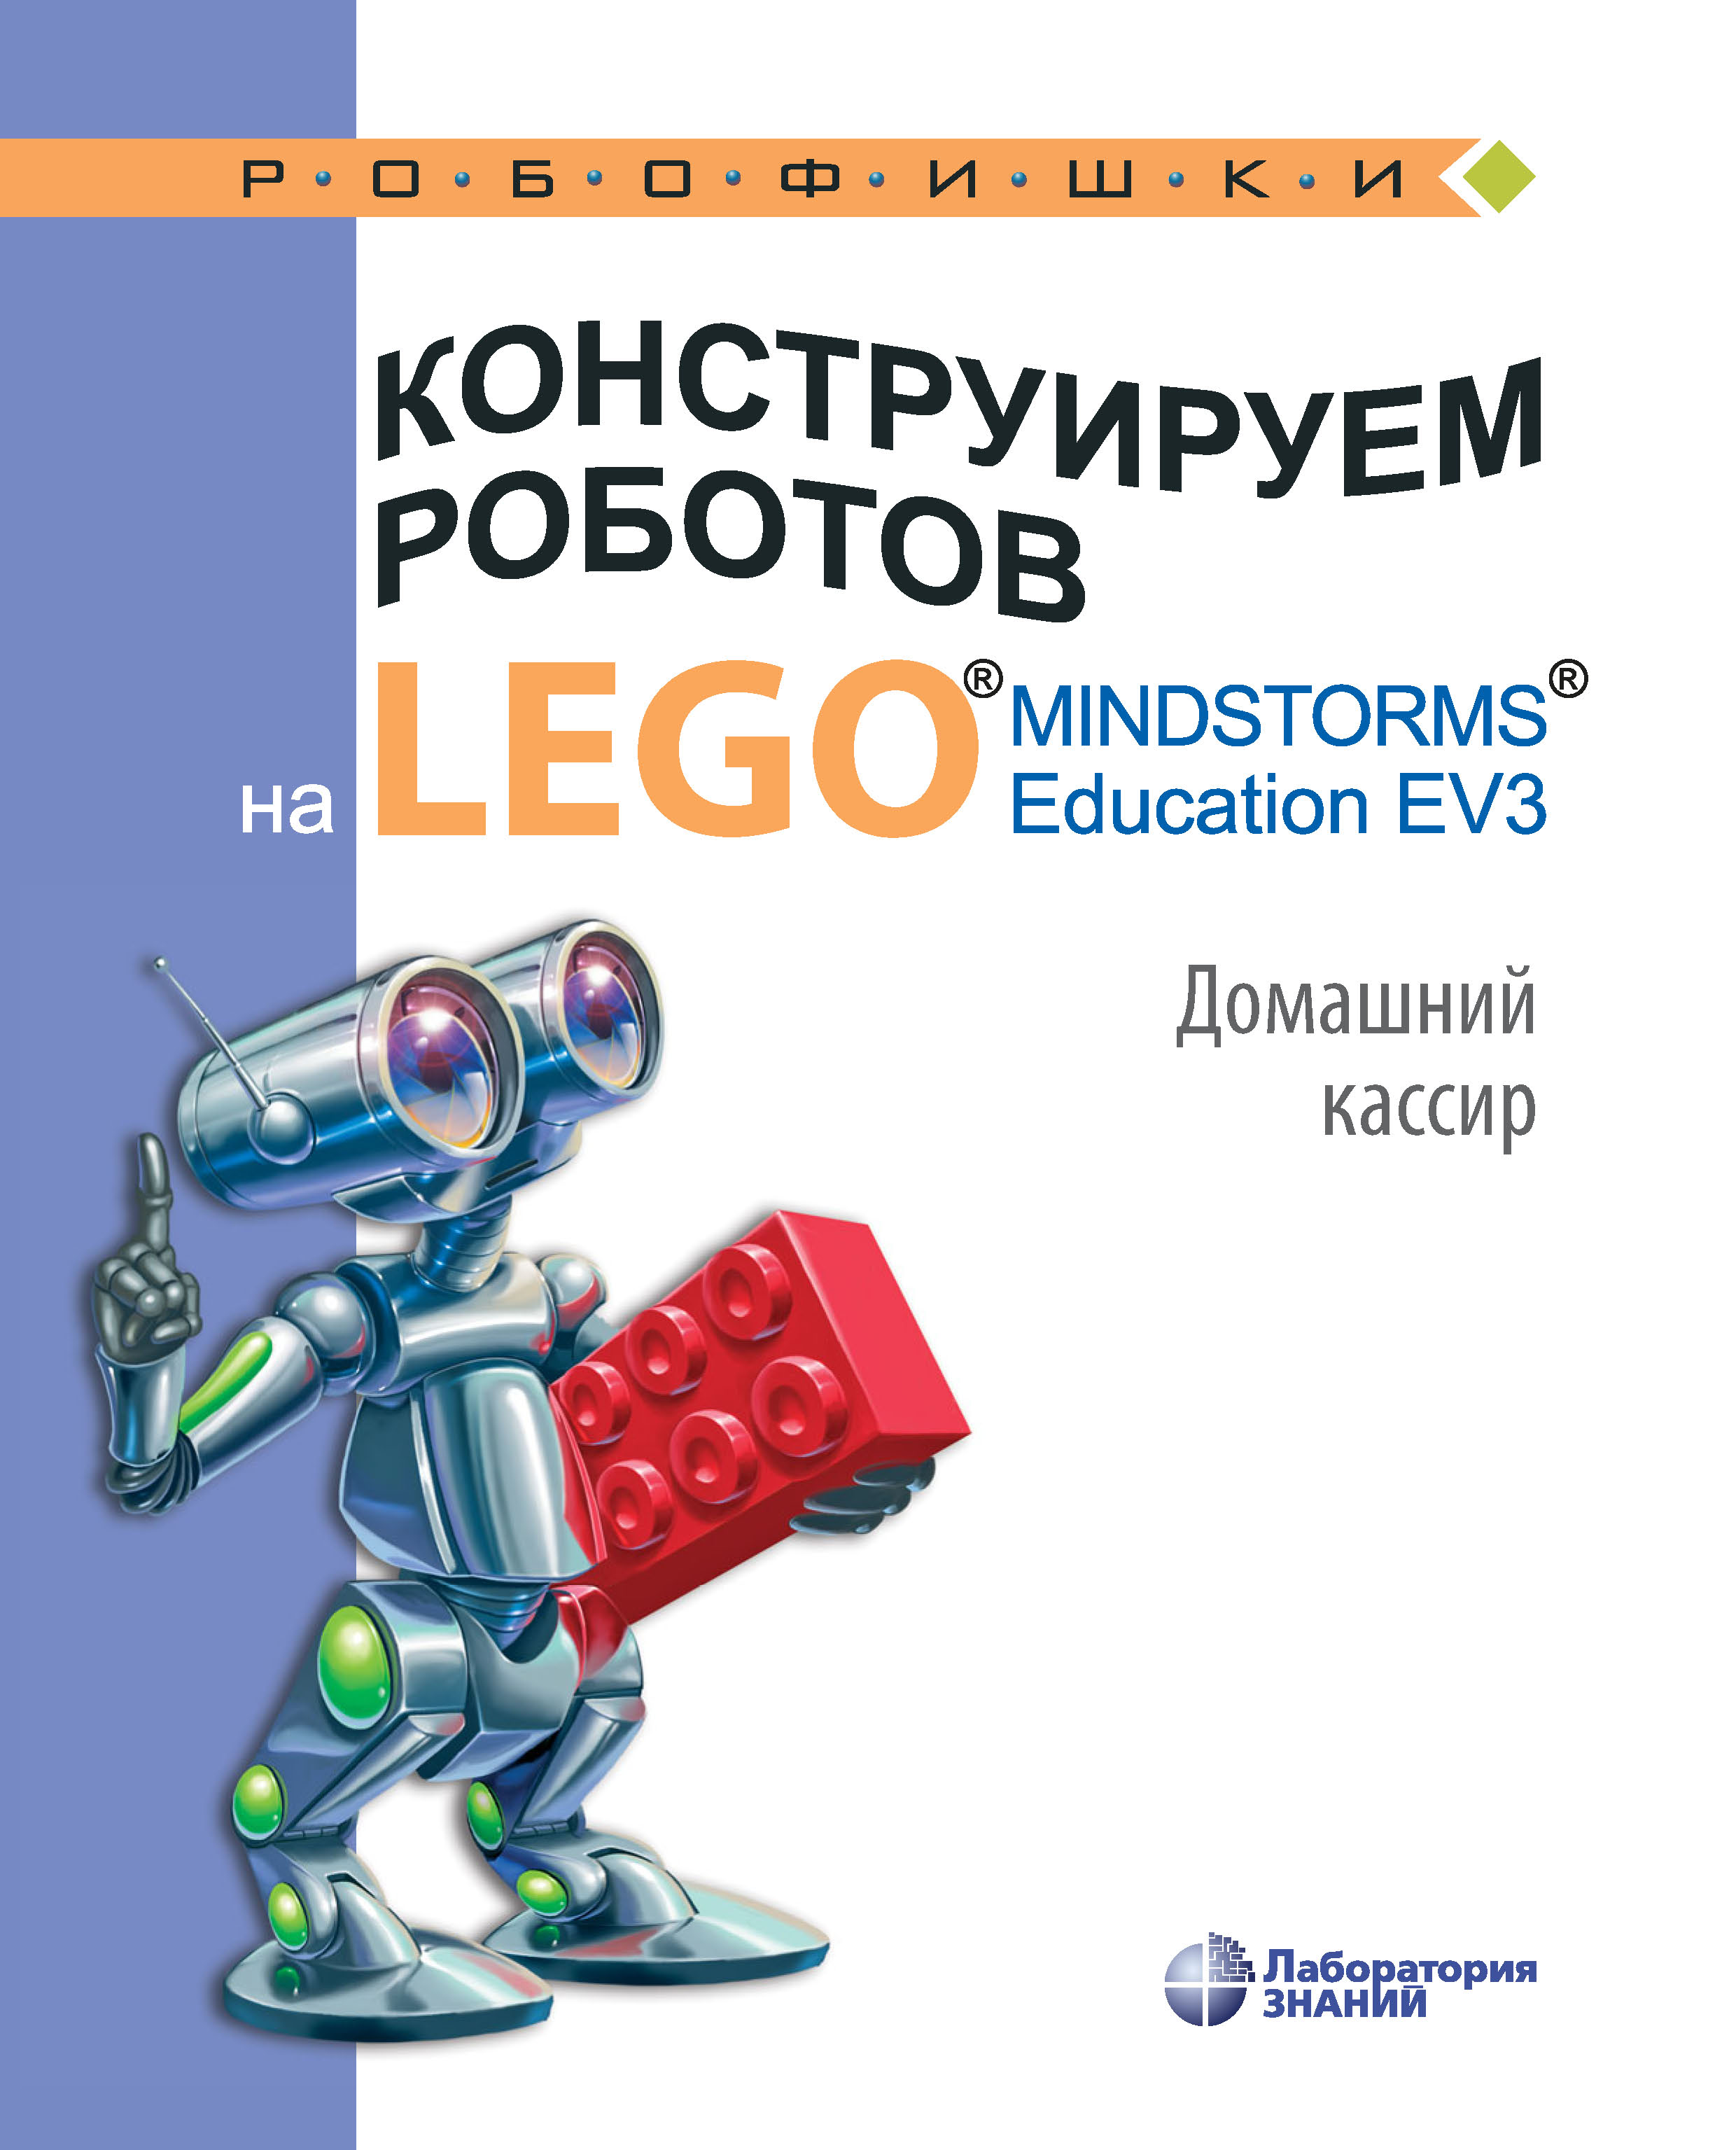 Фото - В. В. Тарапата Конструируем роботов на LEGO MINDSTORMS Education EV3. Домашний кассир тарапата в конструируем роботов на lego education ev3 ханойская башня илл шкерин мробофишки тарапата